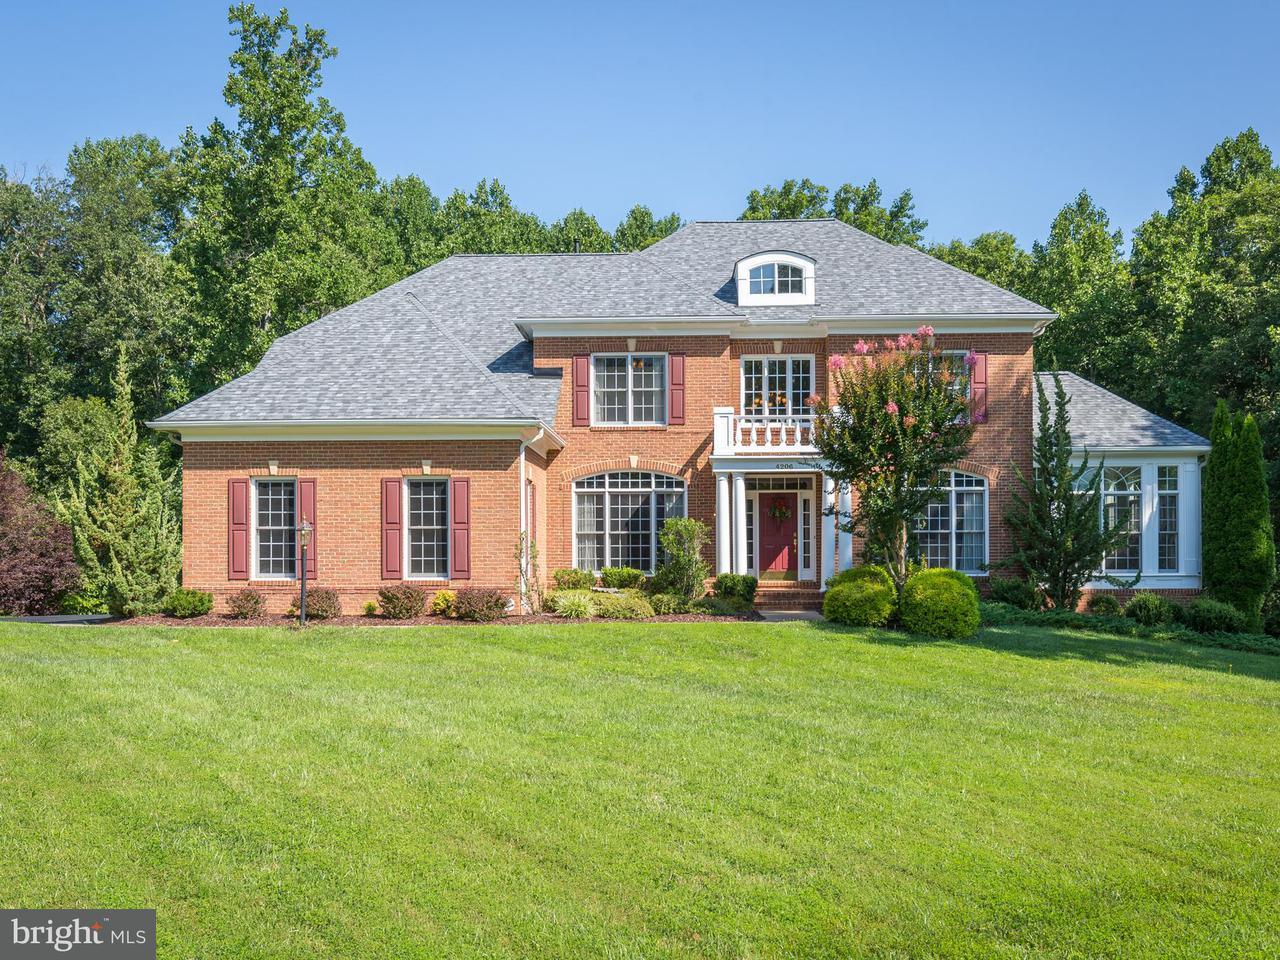 Single Family Home for Sale at 4206 ROEBURN Court 4206 ROEBURN Court Woodbridge, Virginia 22192 United States